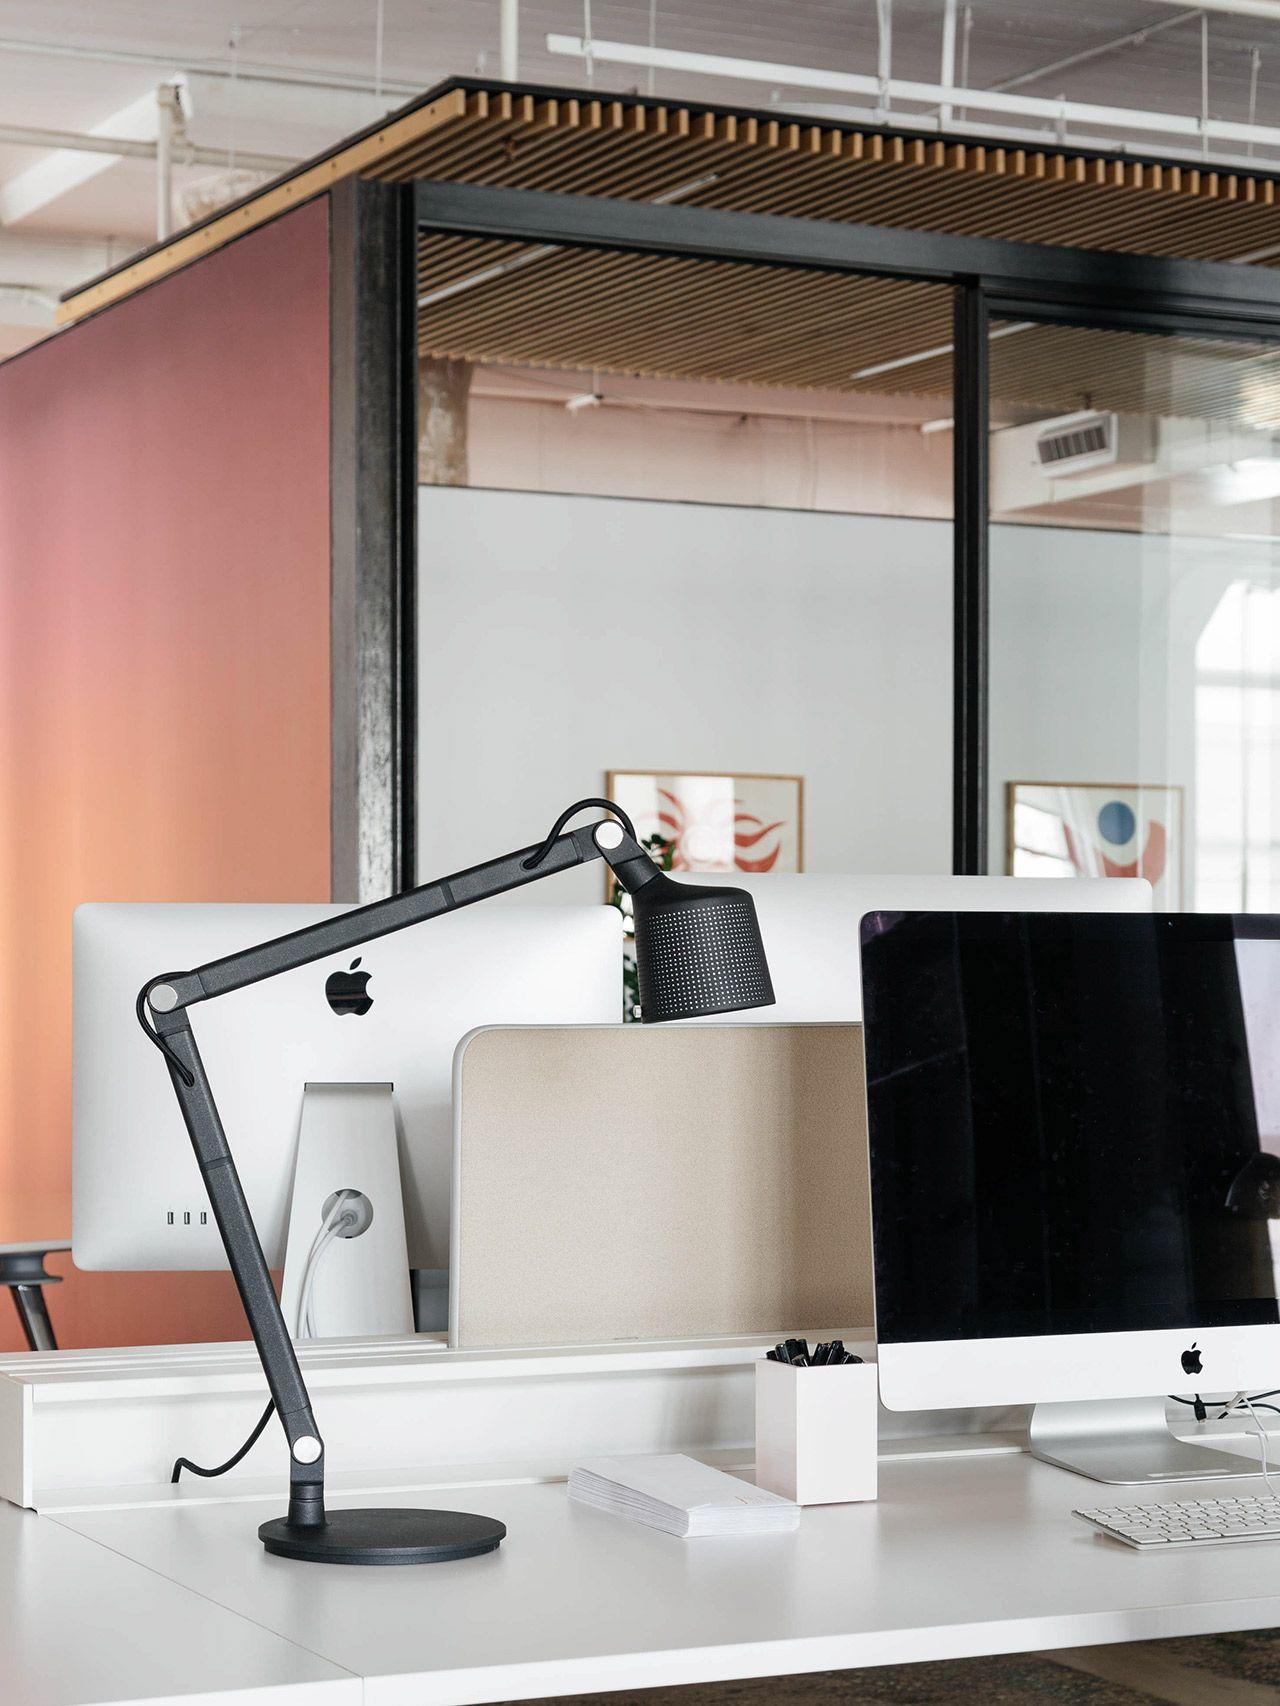 SOHO office Desk lamp, Soho, Home decor